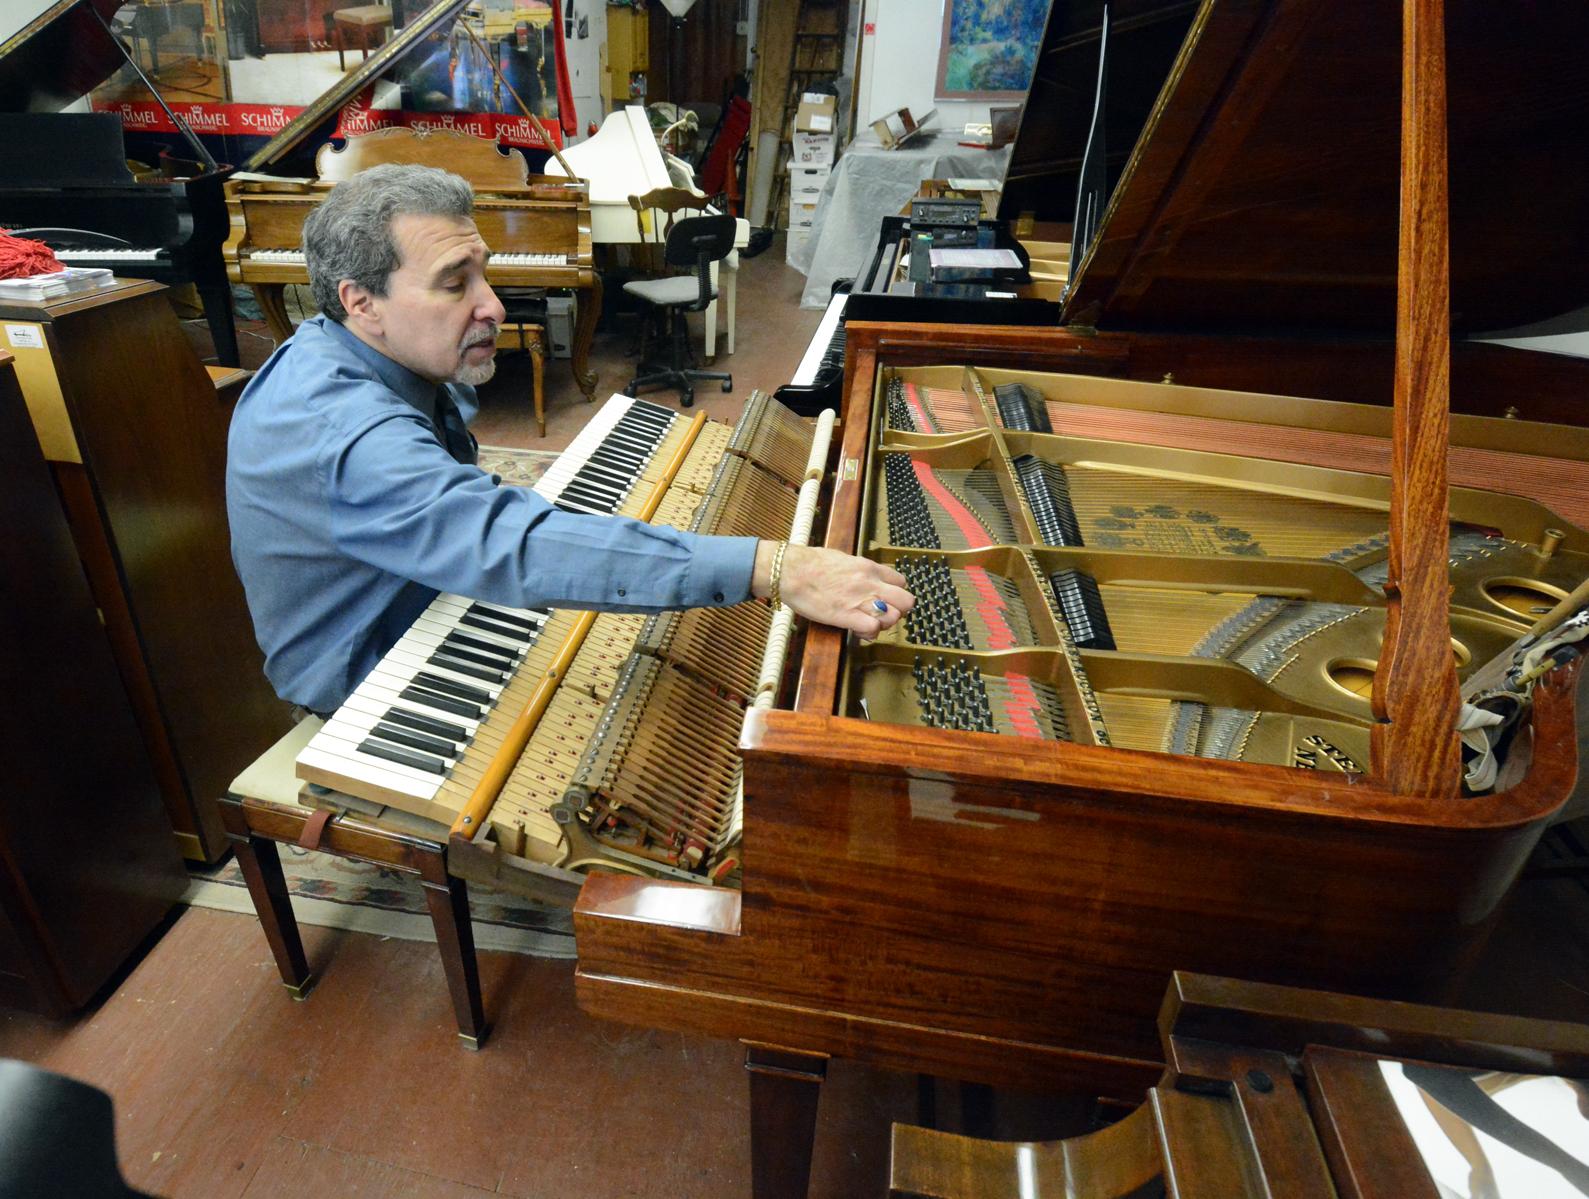 Evan Tublitz working on  Rare Art Case Steinway Grand